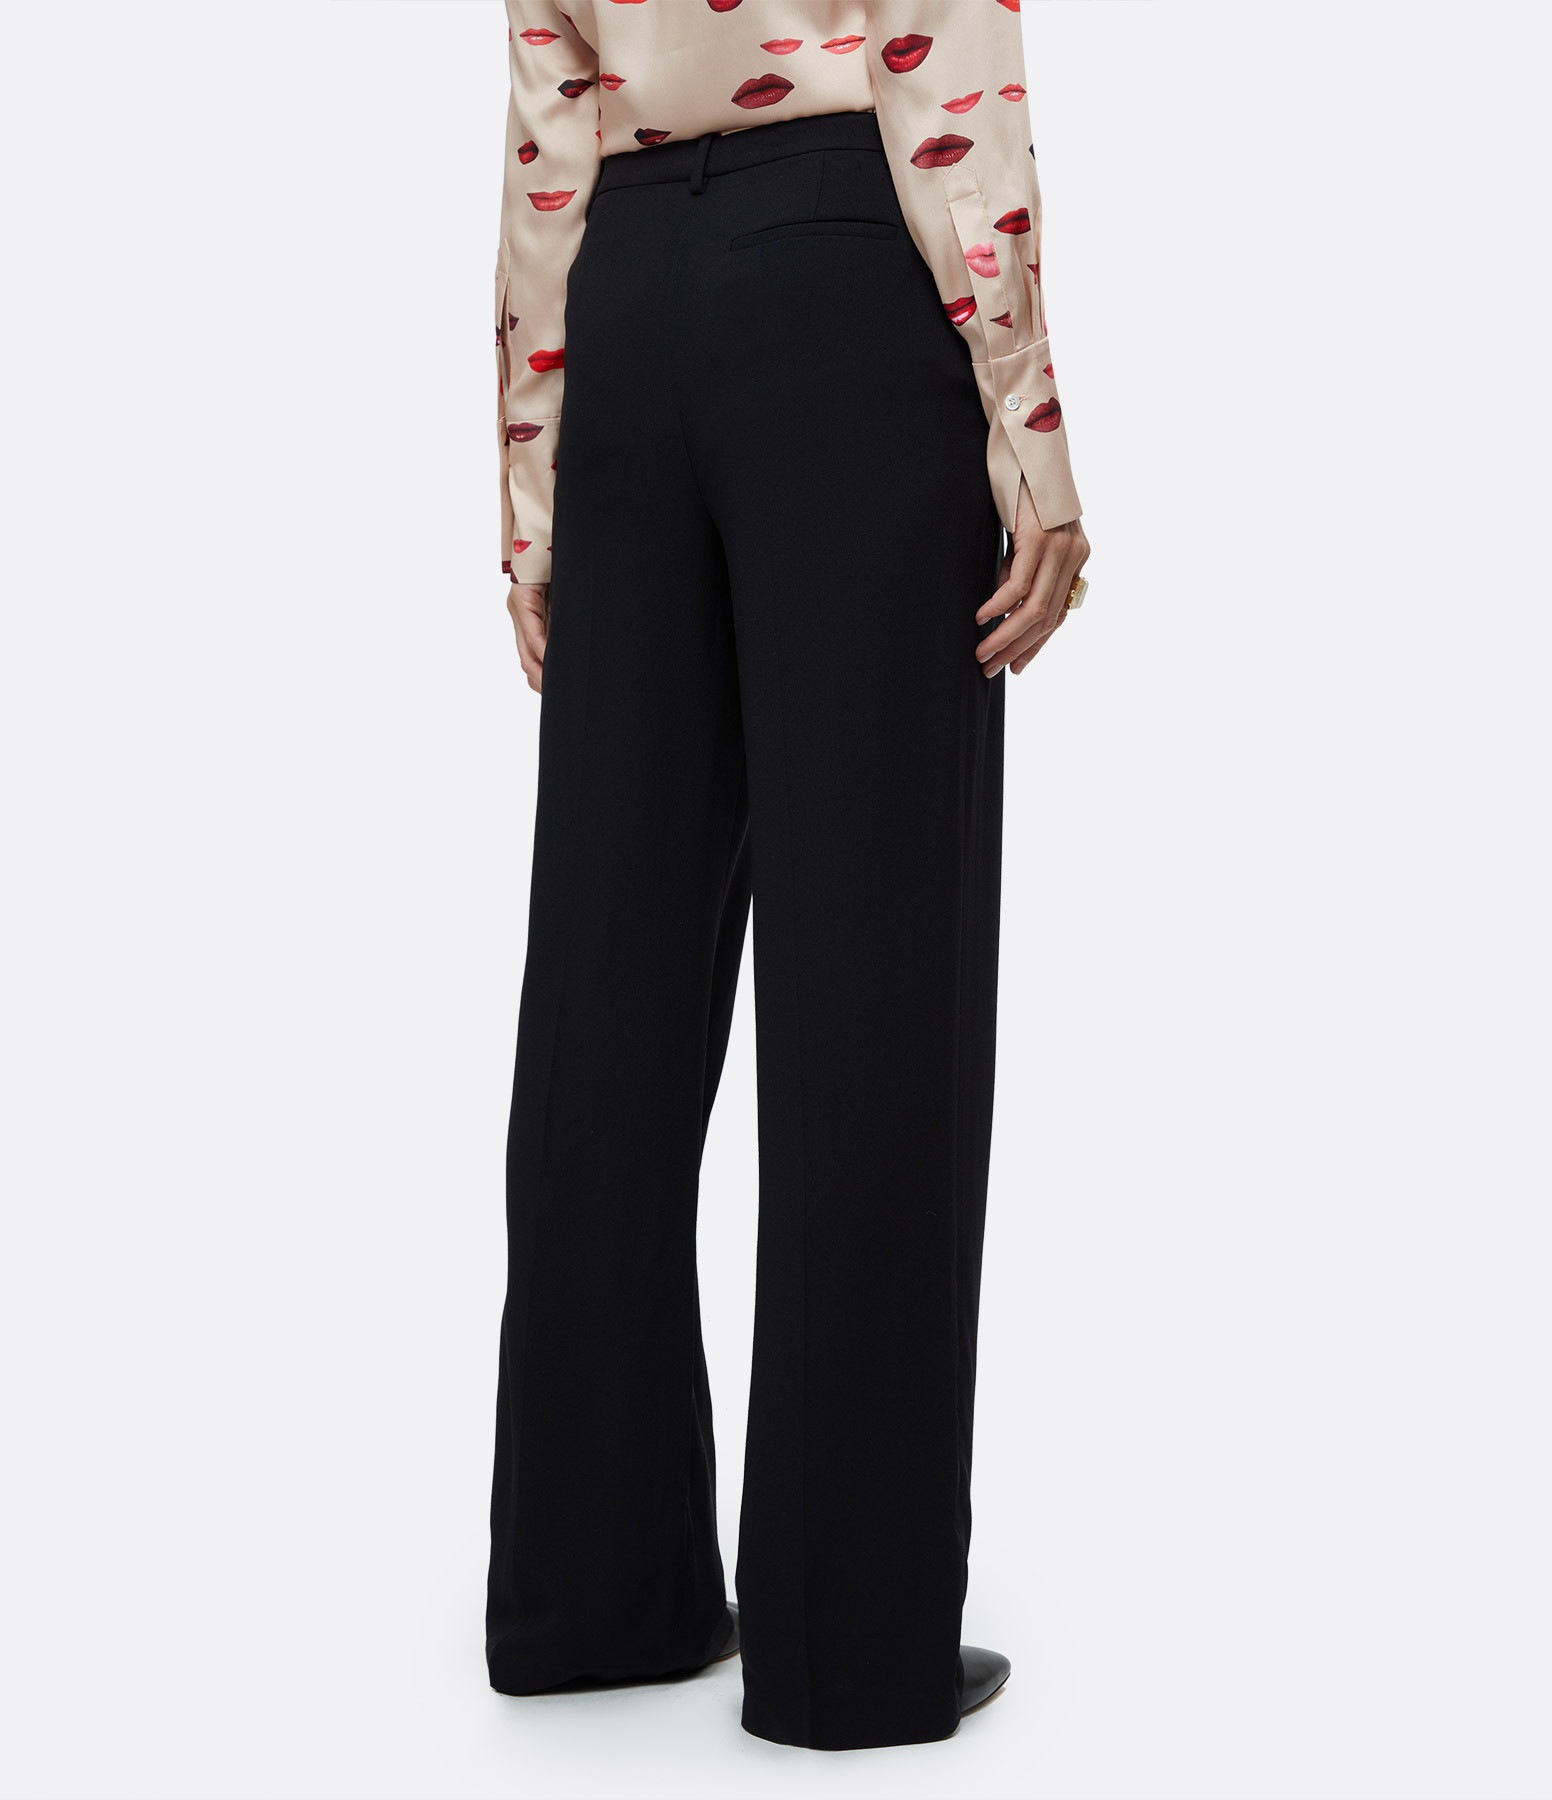 THEORY - Pantalon Large Noir